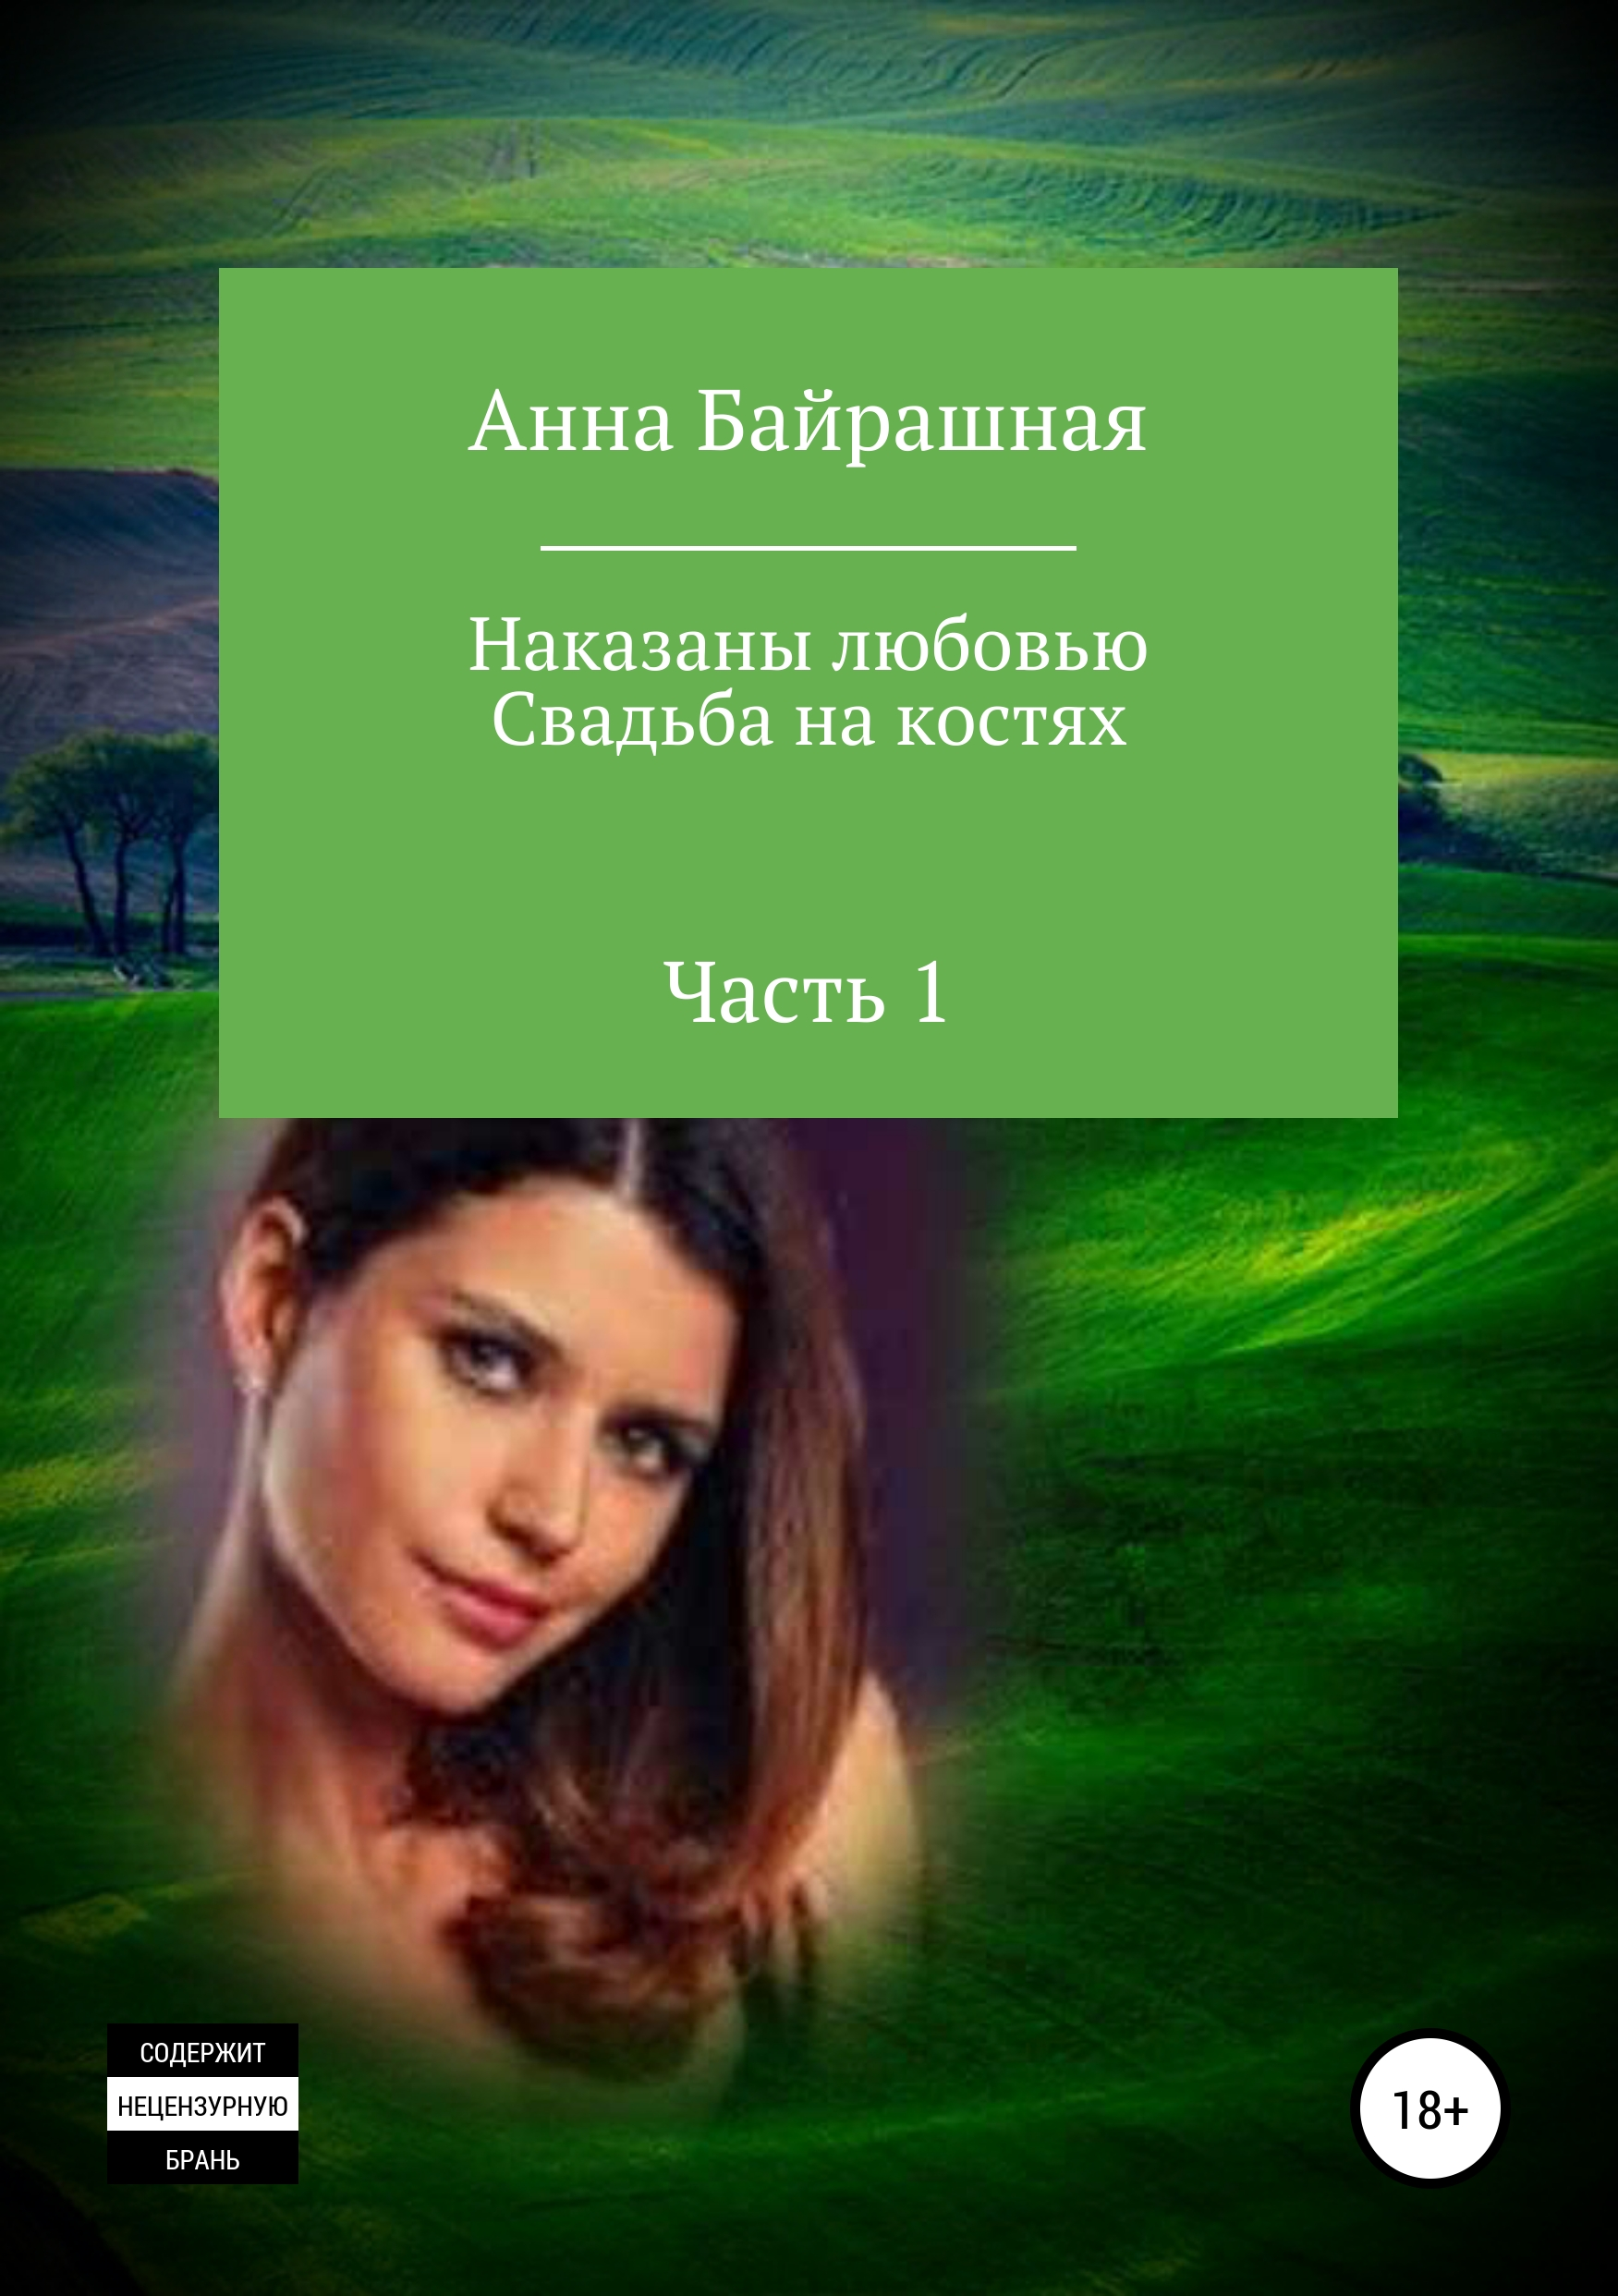 Анна Сергеевна Байрашная Свадьба на костях. Часть 1 свадьба за свадьбой